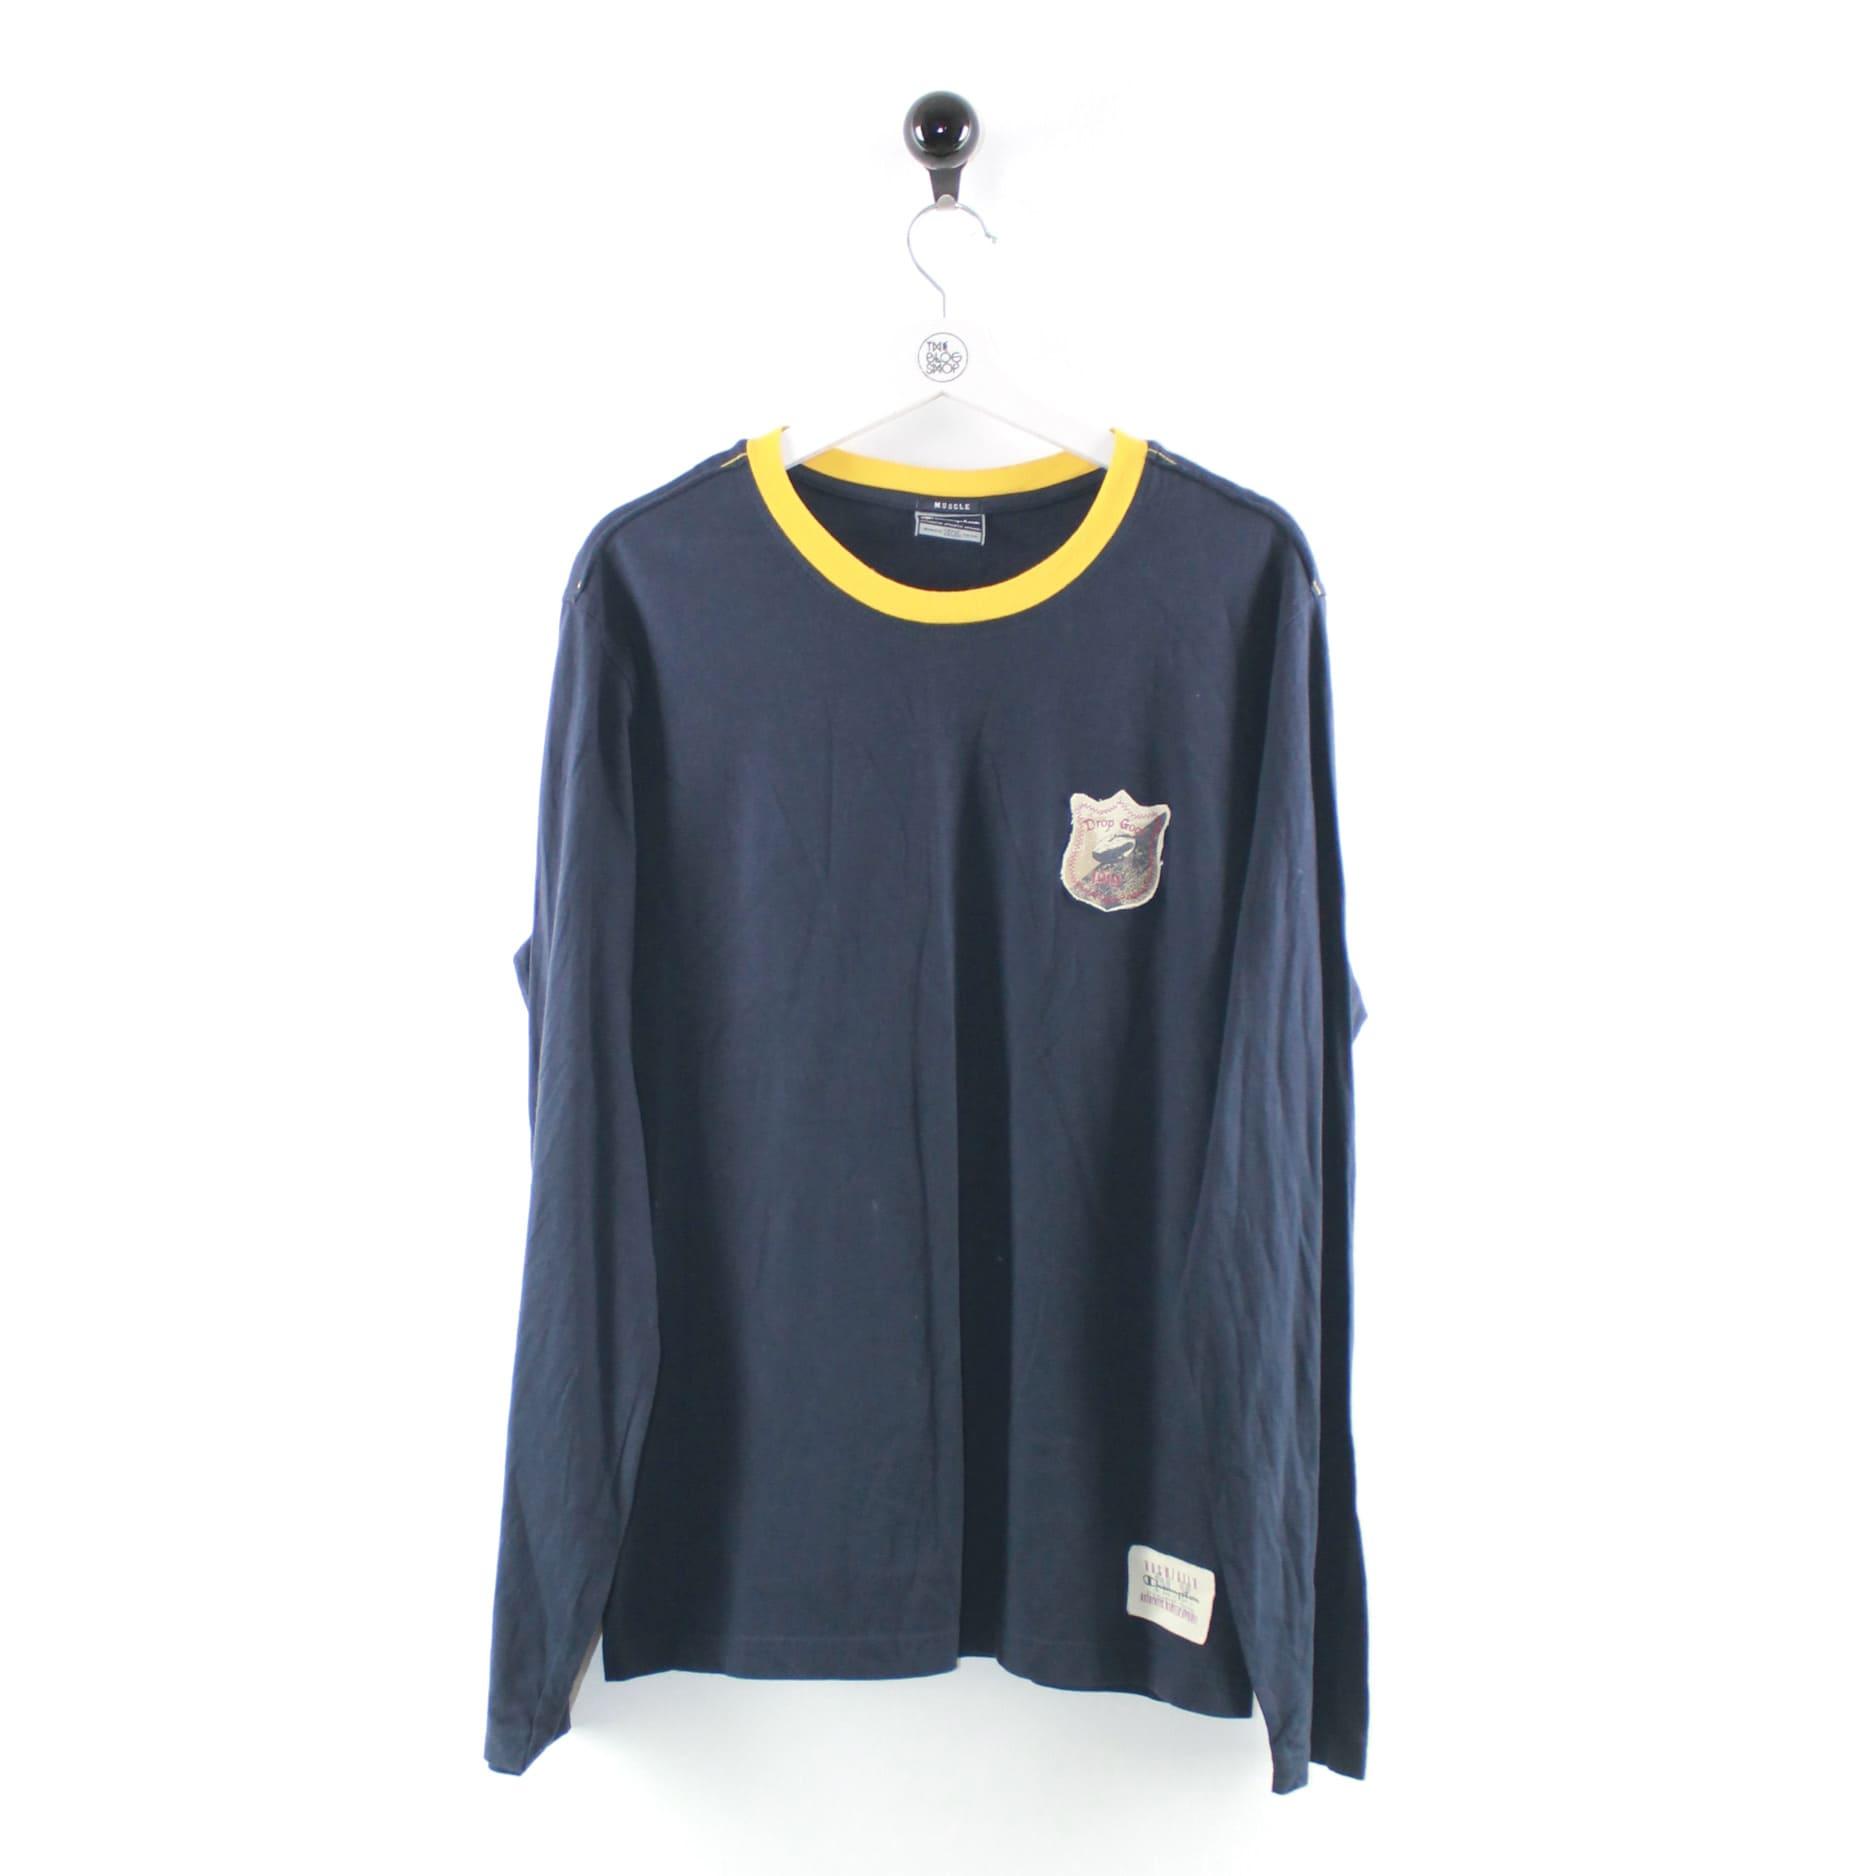 Champion - T-shirt maniche lunghe